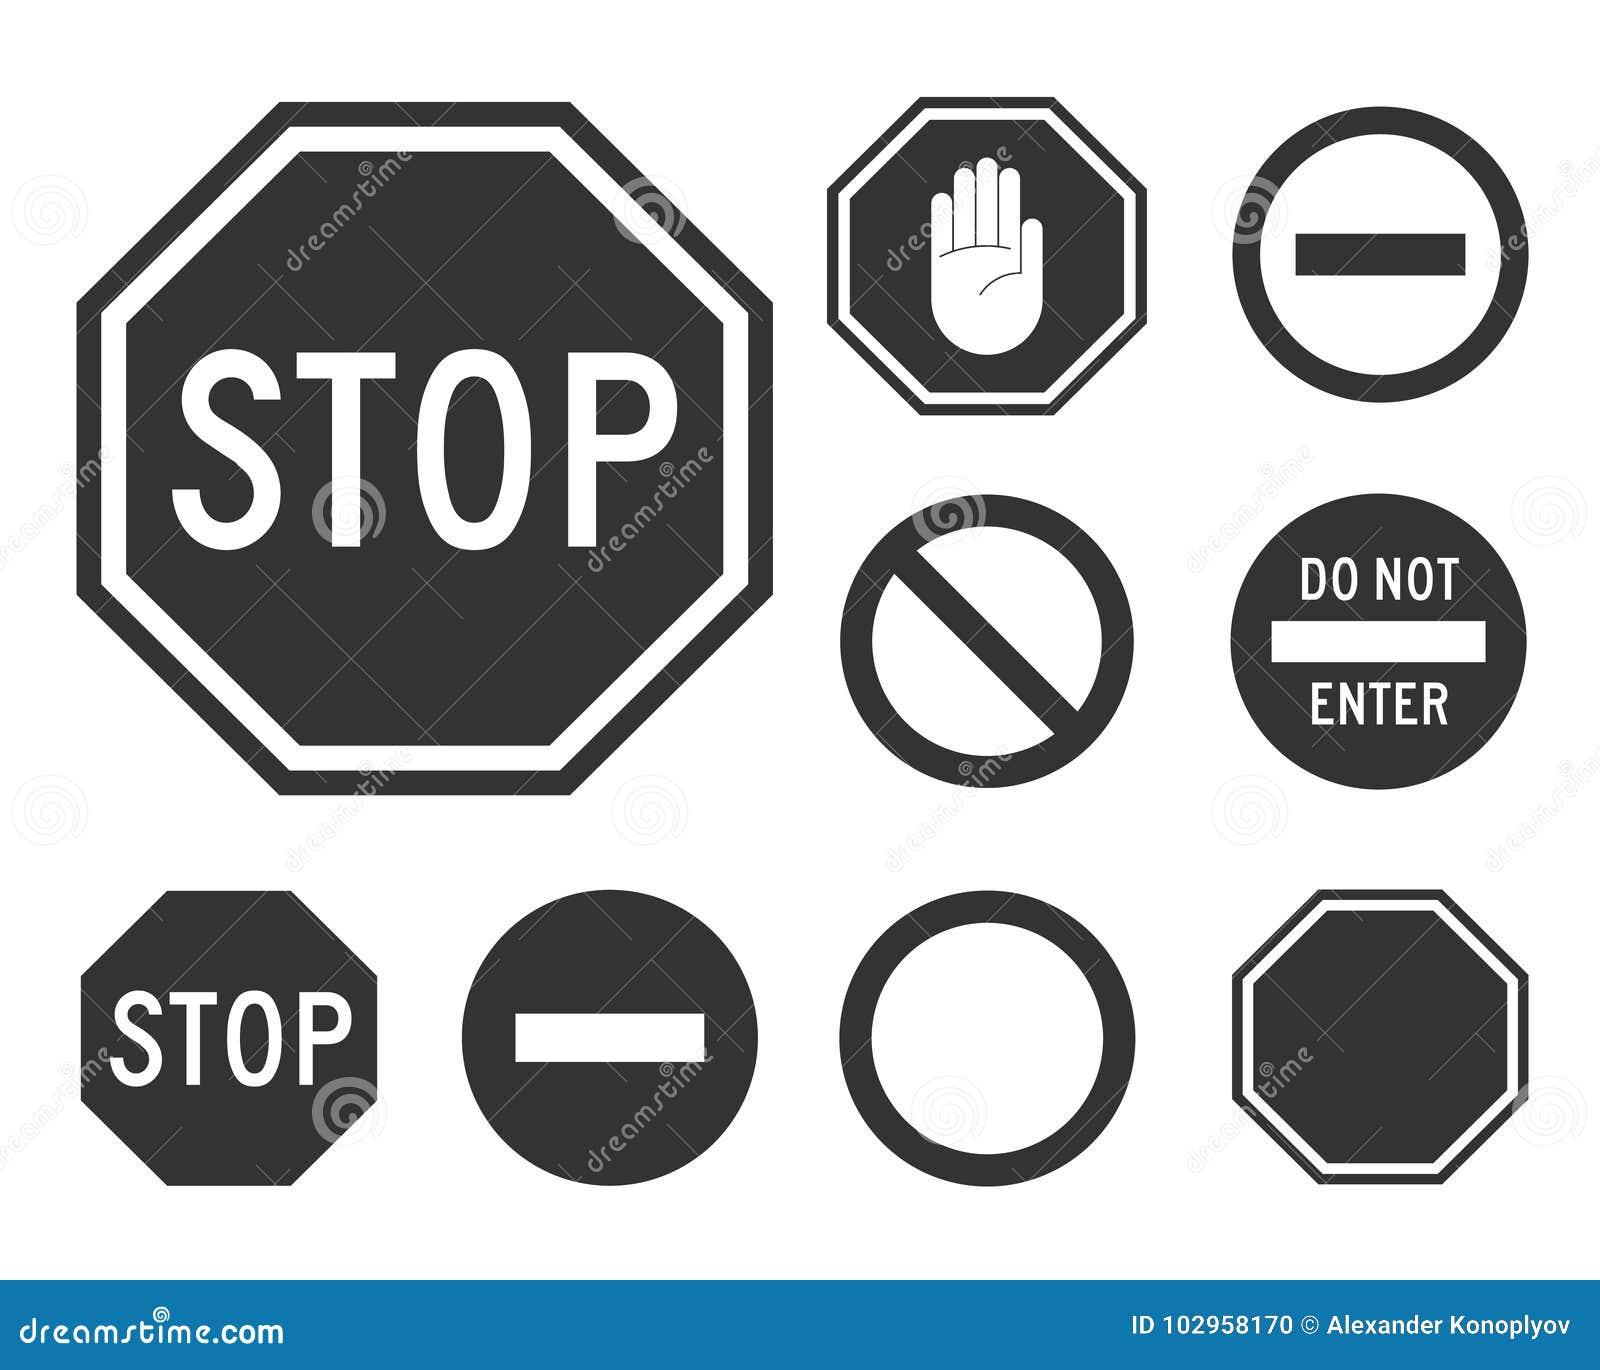 Stop road sign set